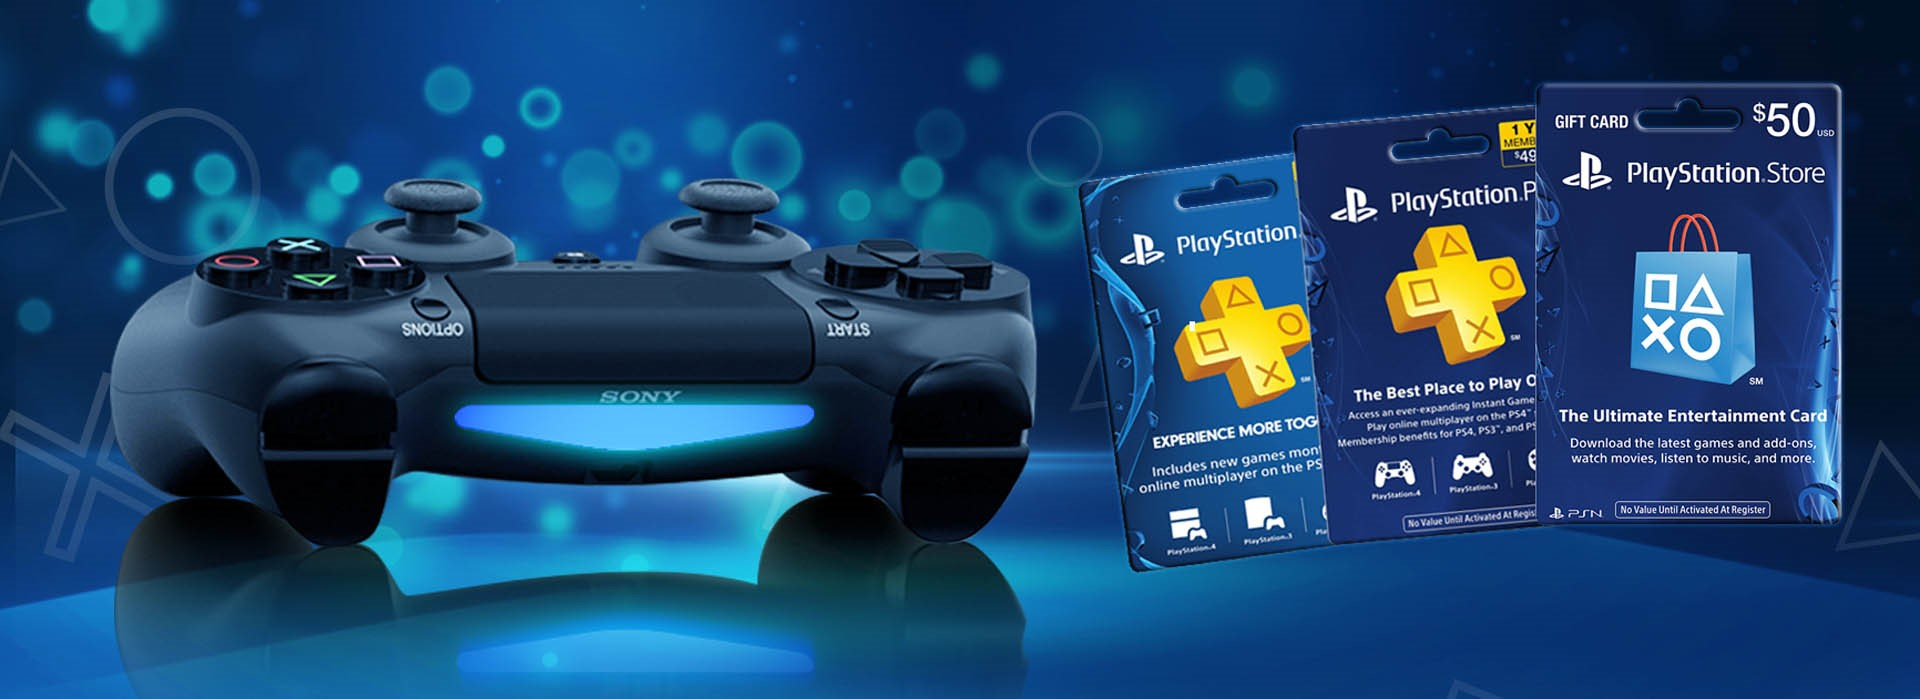 İndirimli Playstation Hediye Kartı Satın Al